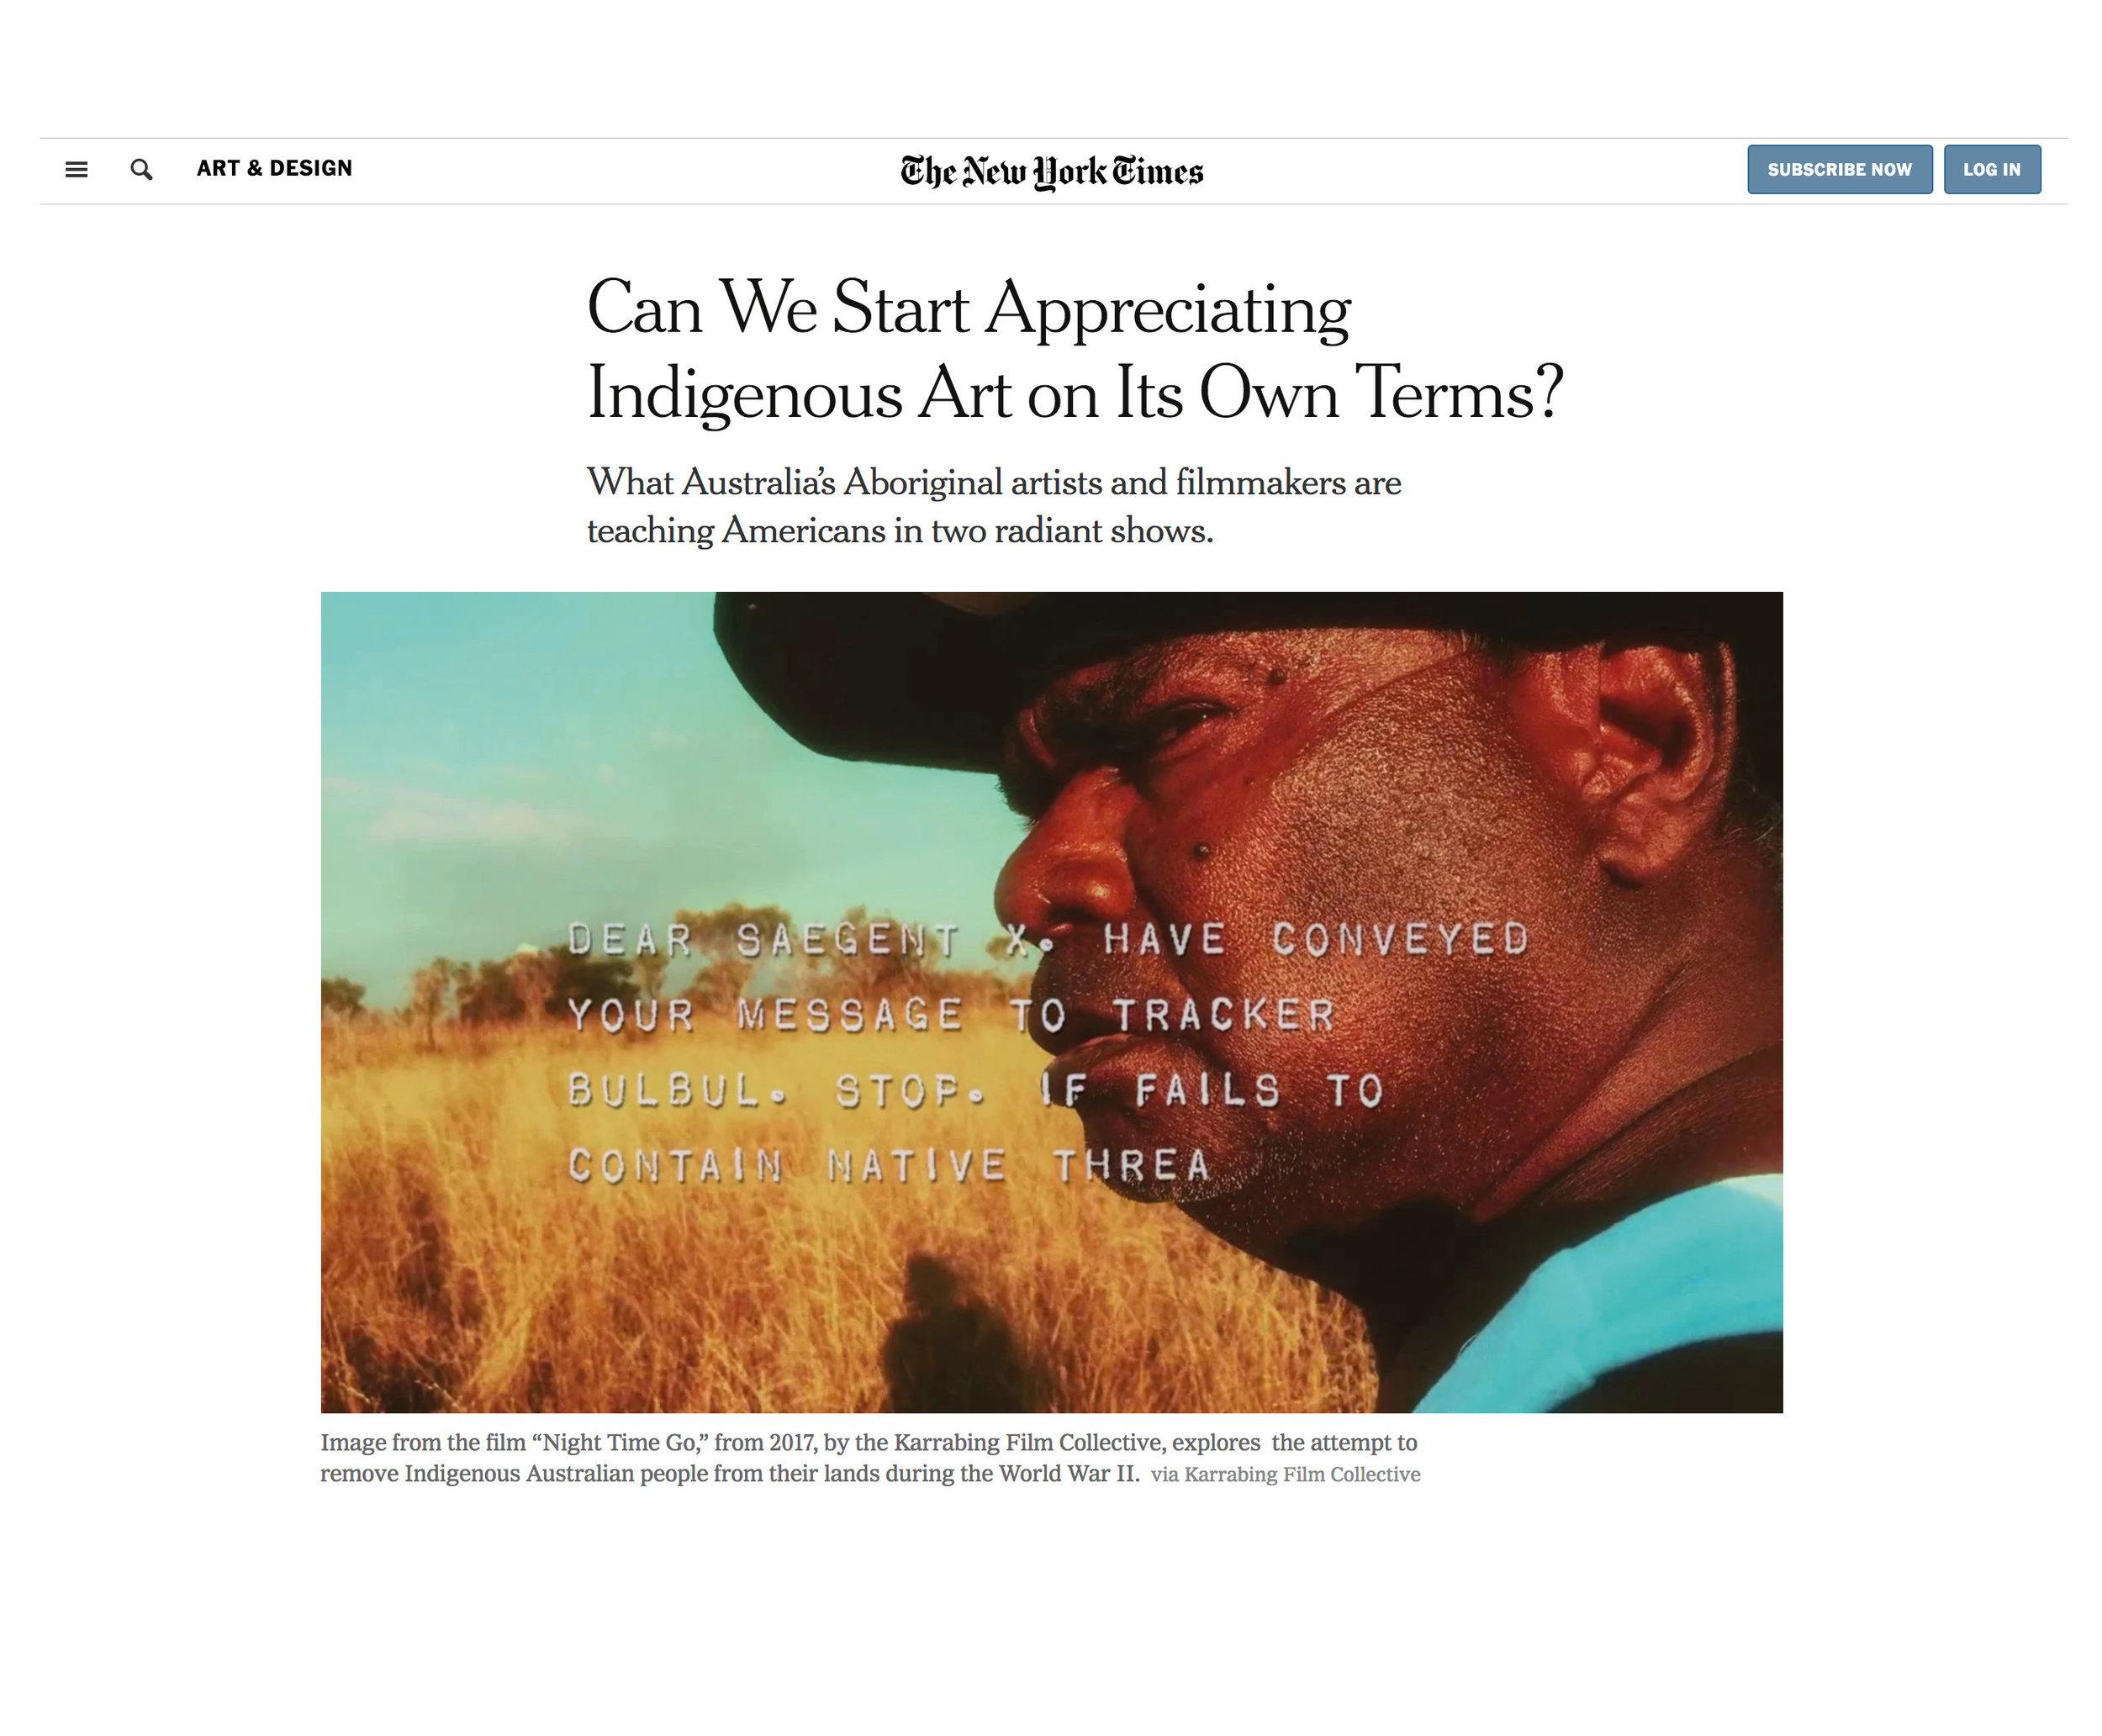 New York Times_Can we start appreciating indigenous art_May 2019.jpg